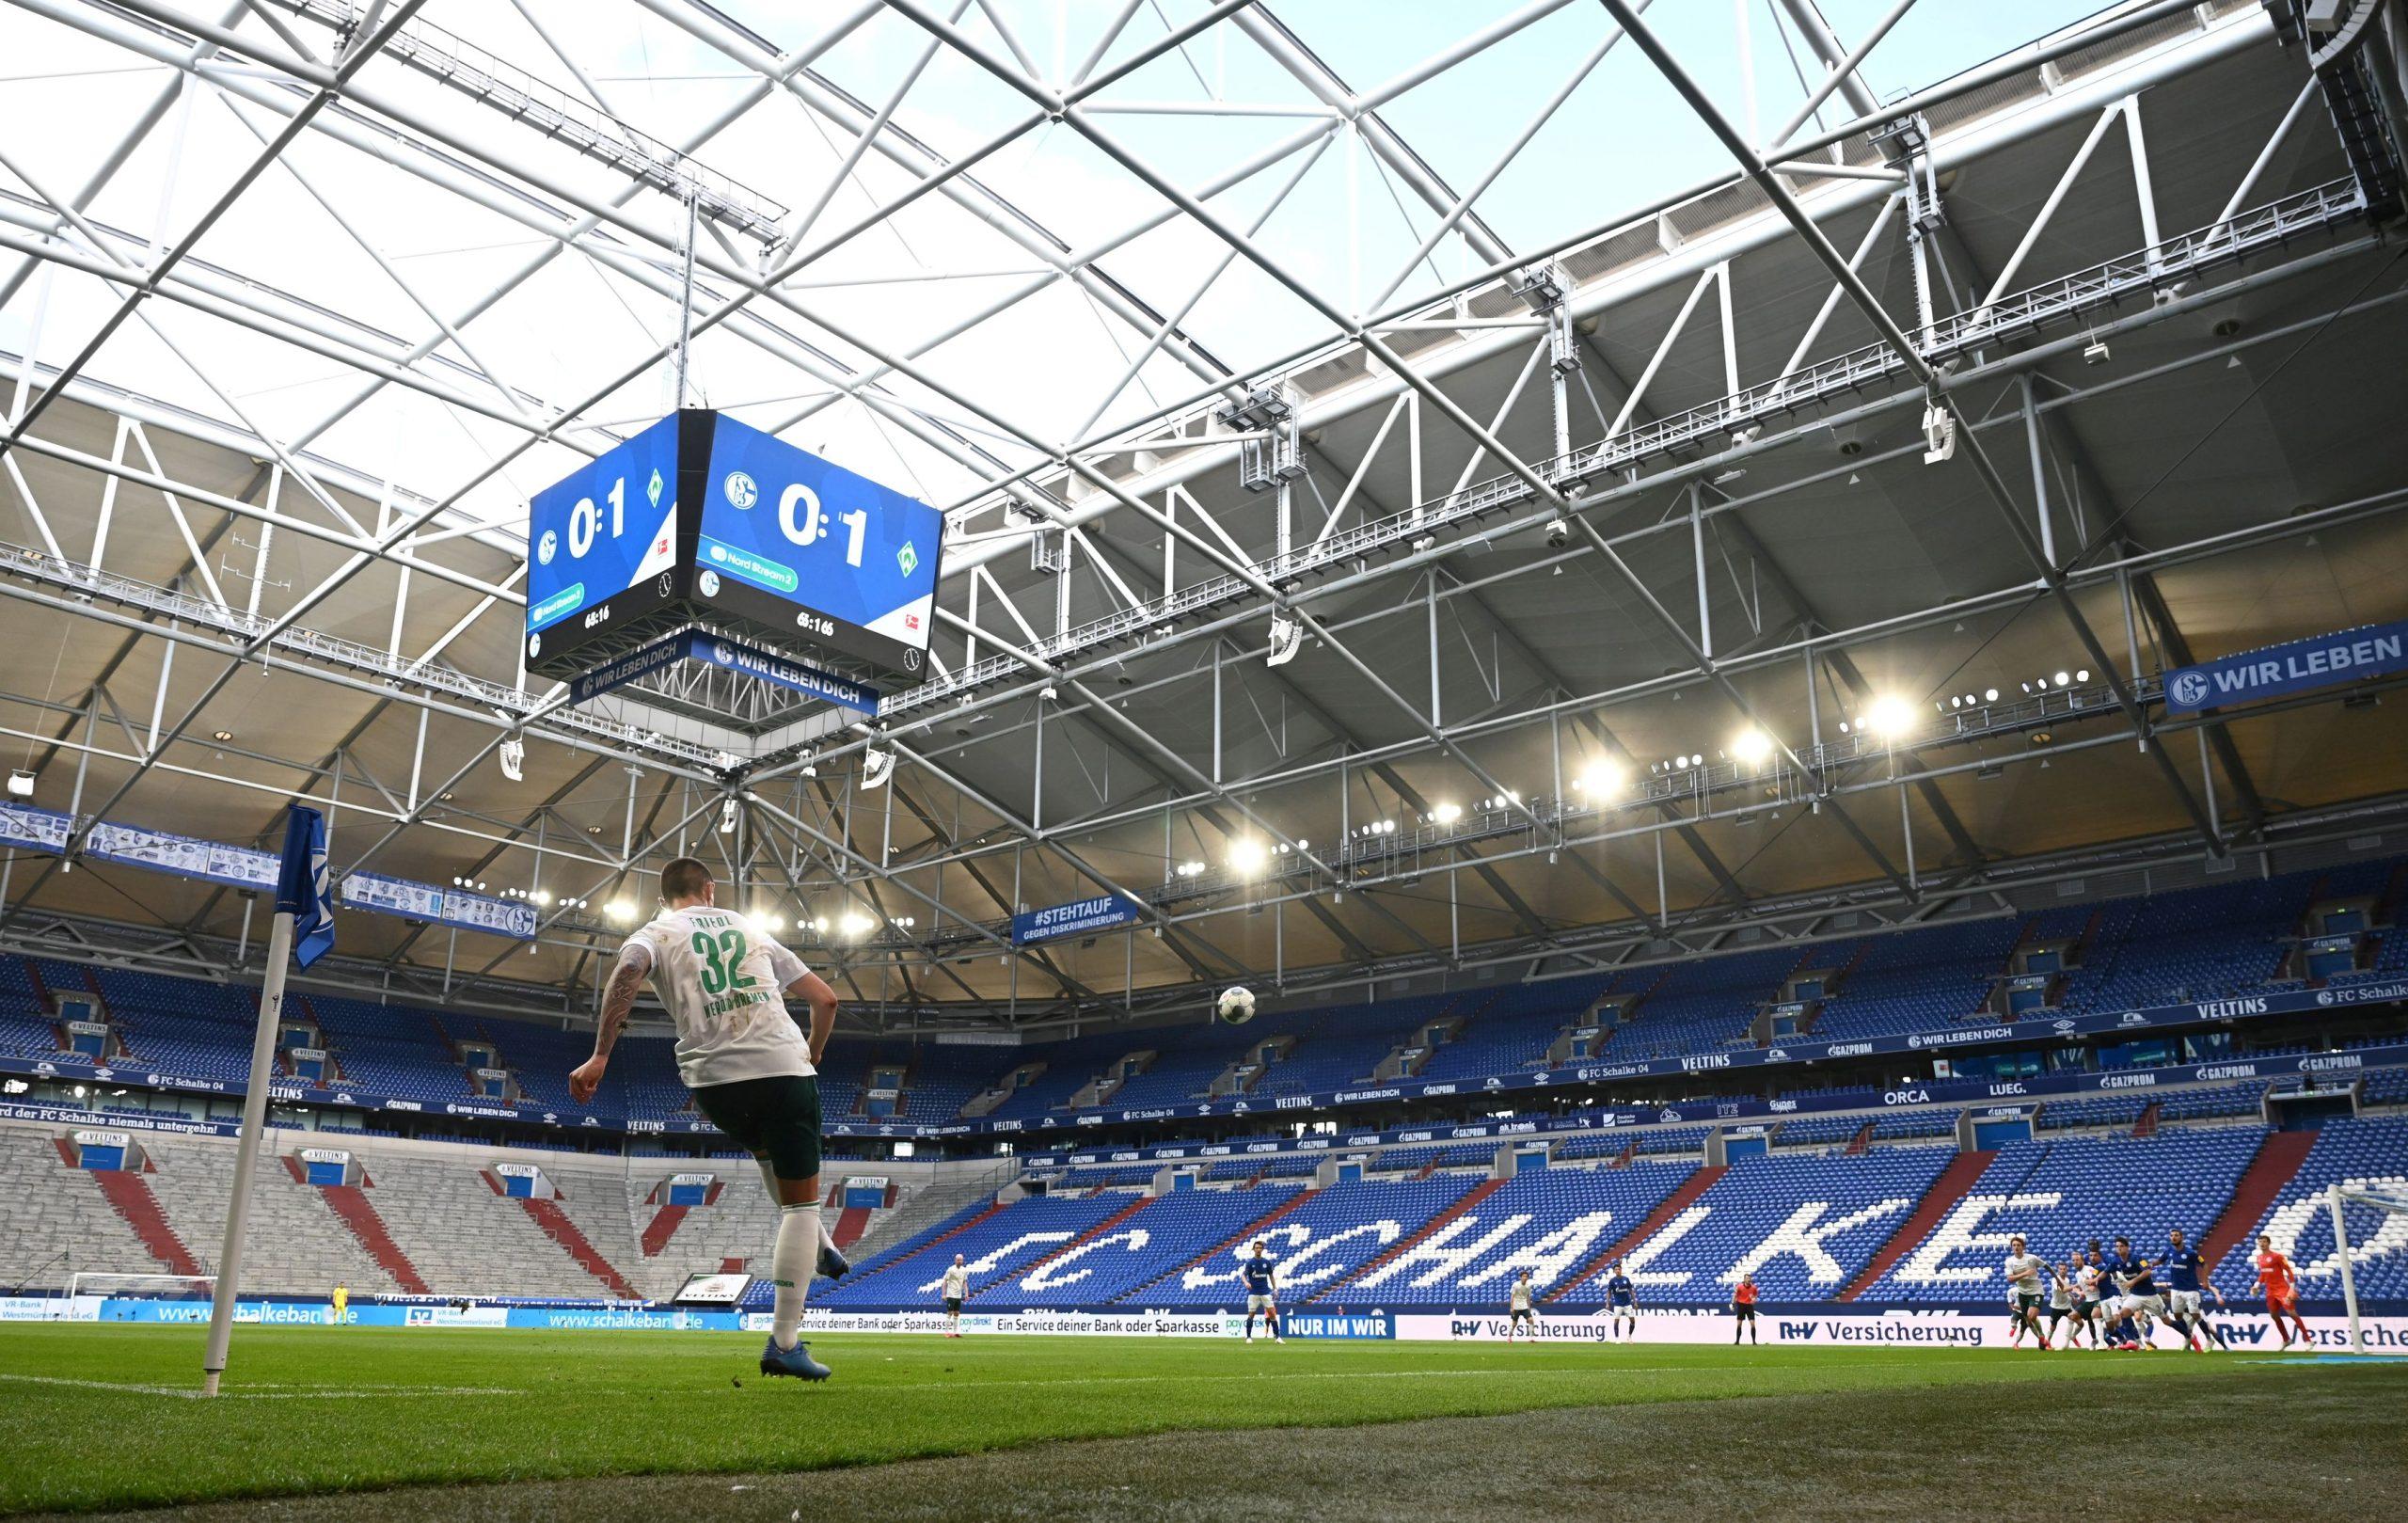 Na AufSchalke Areni ove sezone ima puno problema/Foto REUTERS